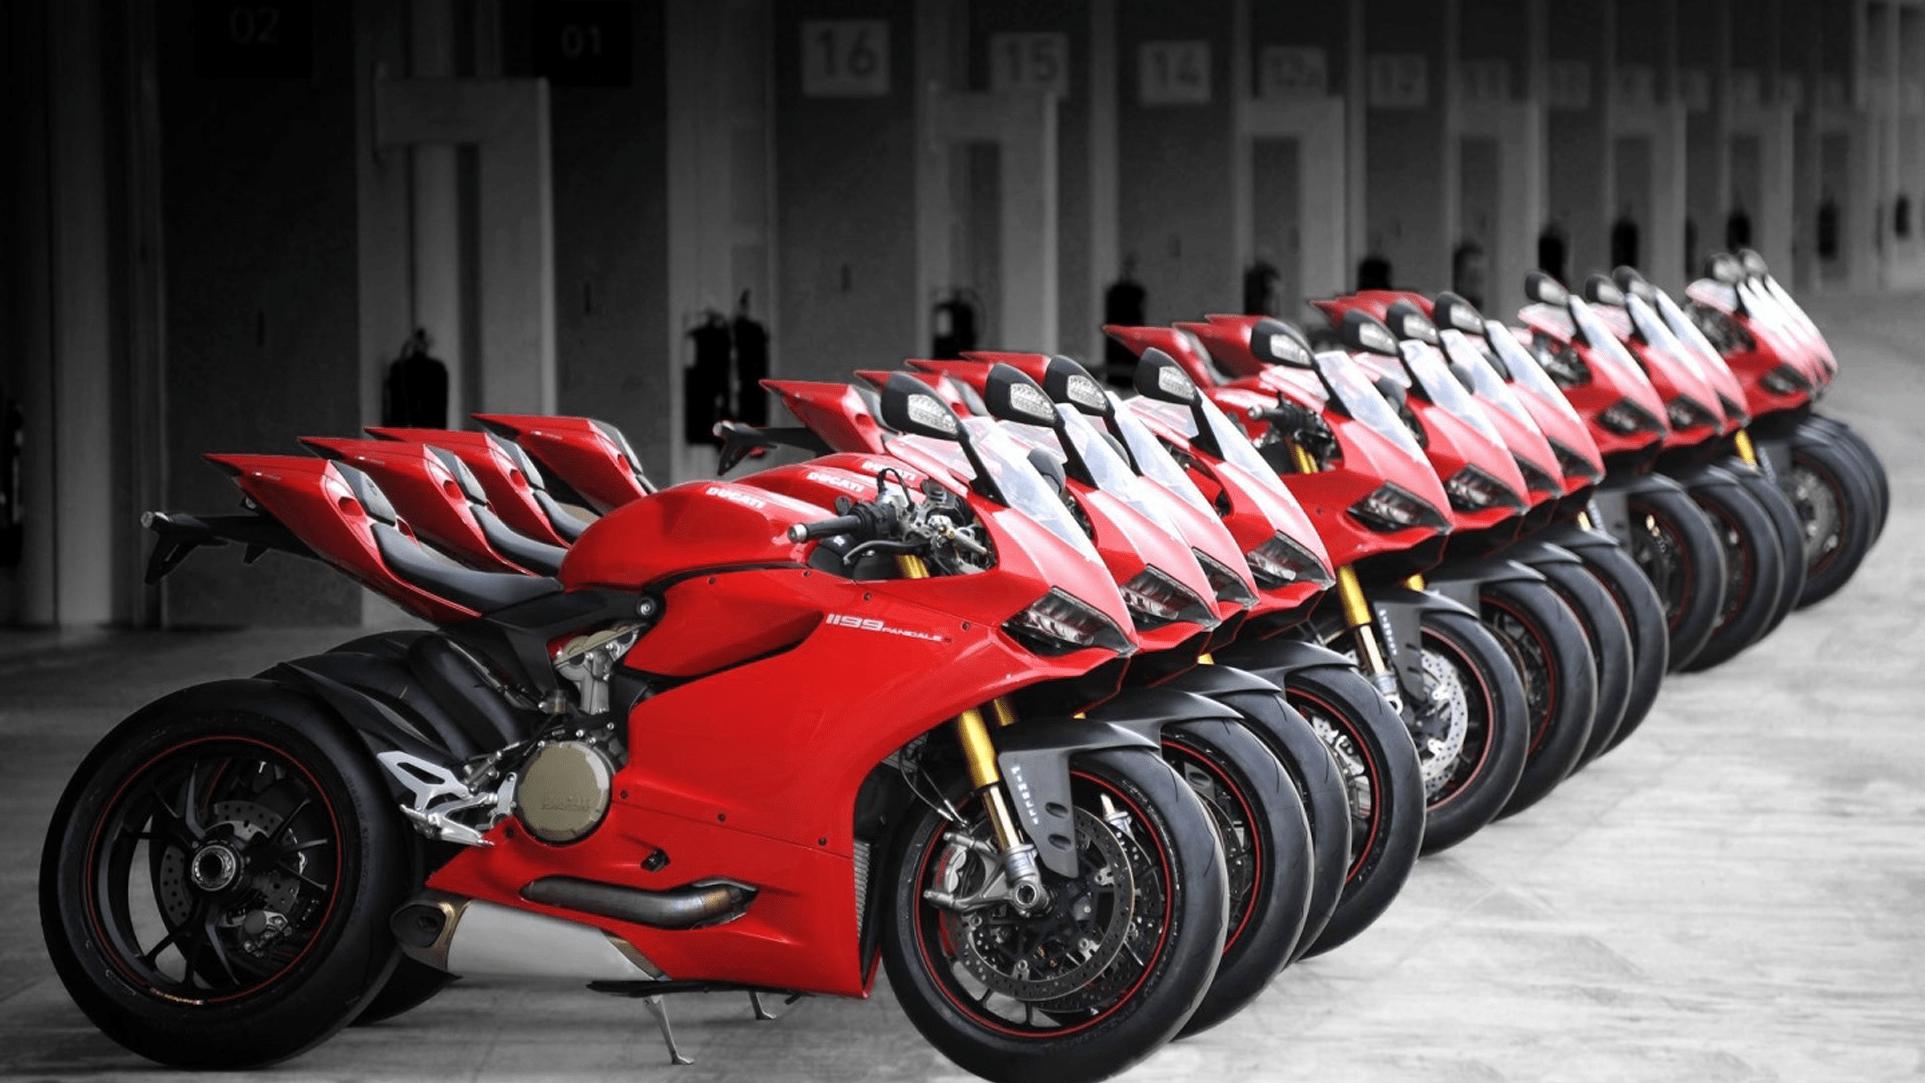 Ducati Wallpapers Top Free Ducati Backgrounds